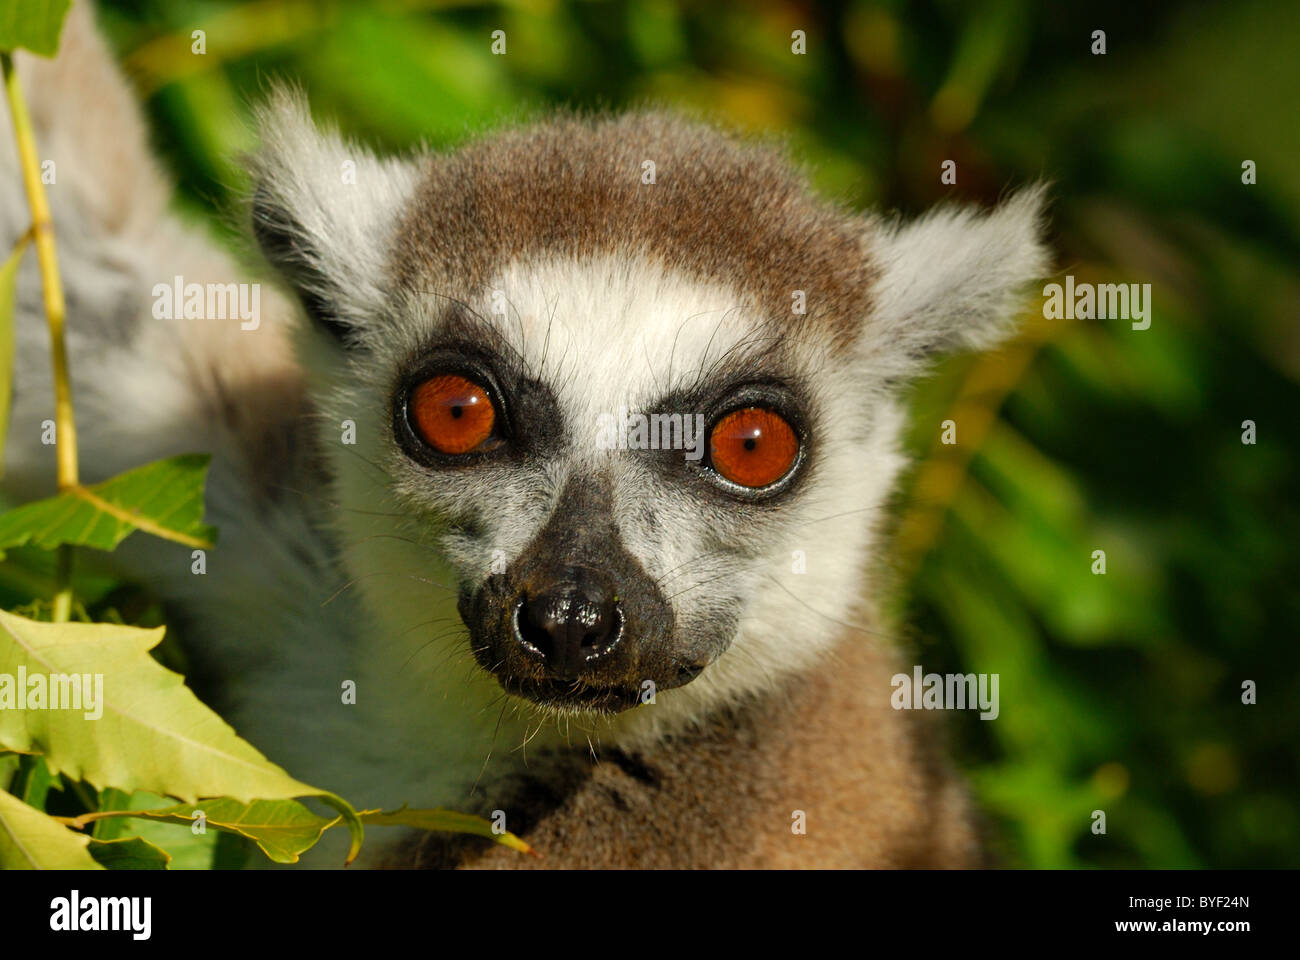 Katta im Berenty Reserve, Madagaskar Stockbild